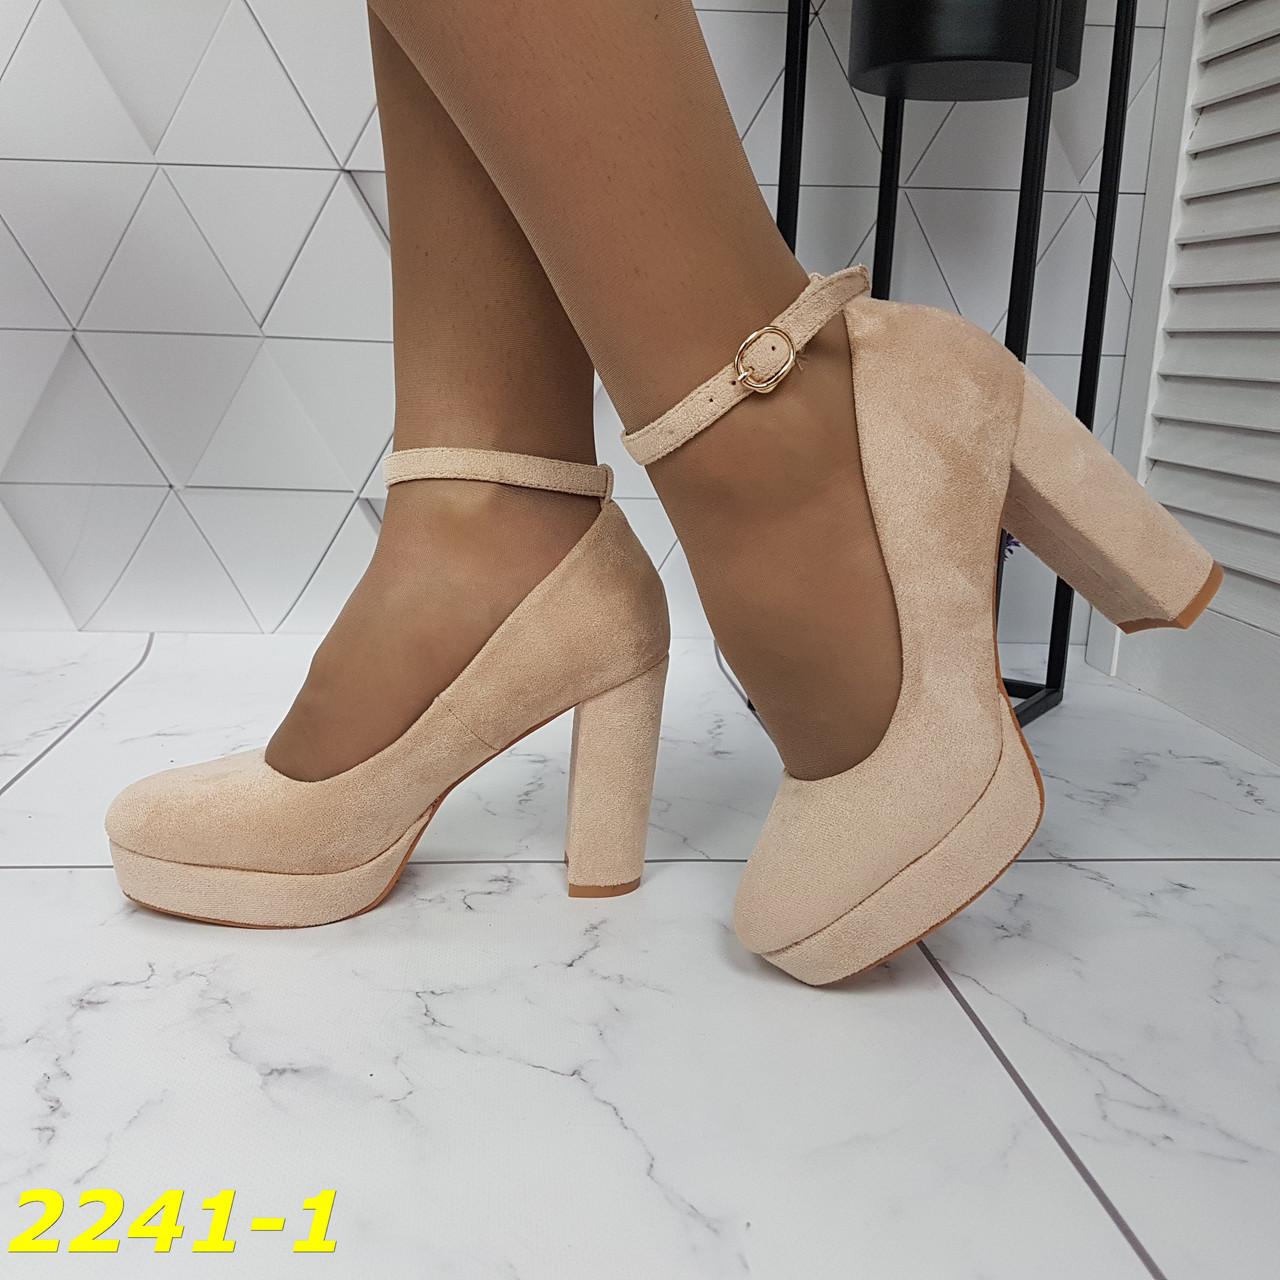 Туфли замшевые с ремешком застежкой на устойчивом широком каблуке бежевые